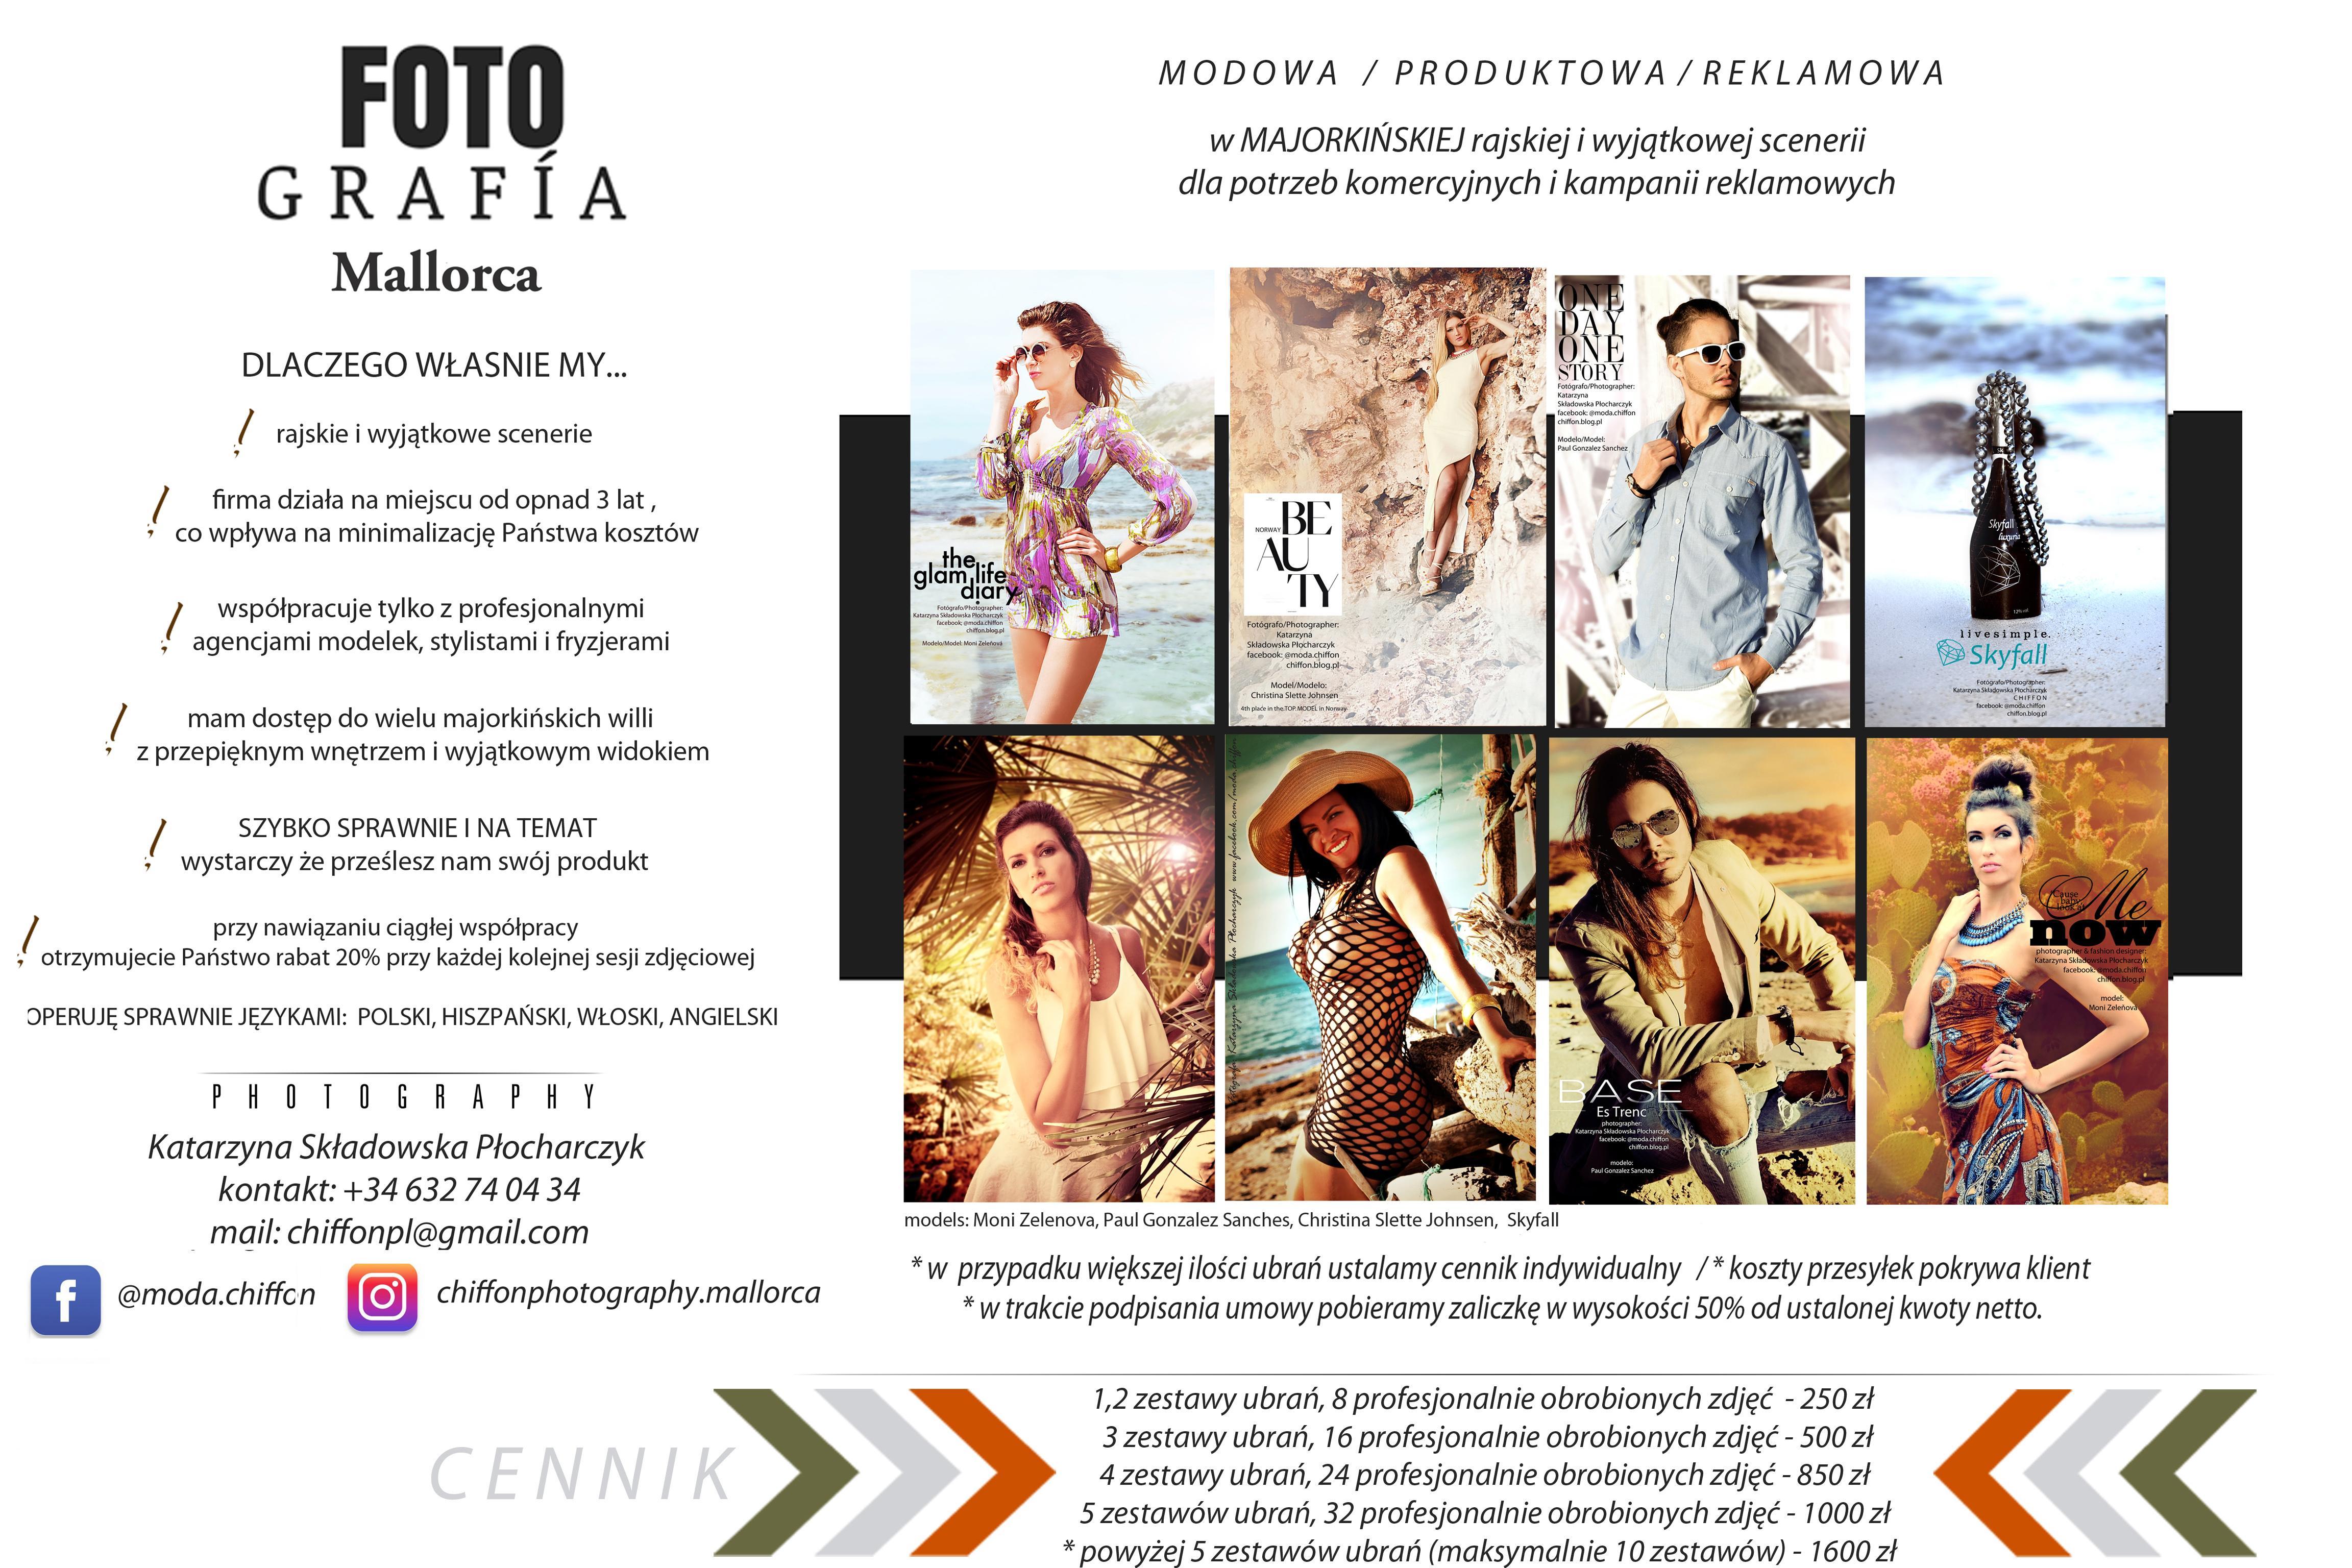 Fotografia modowa produktowa i reklamowa na MAJORCE